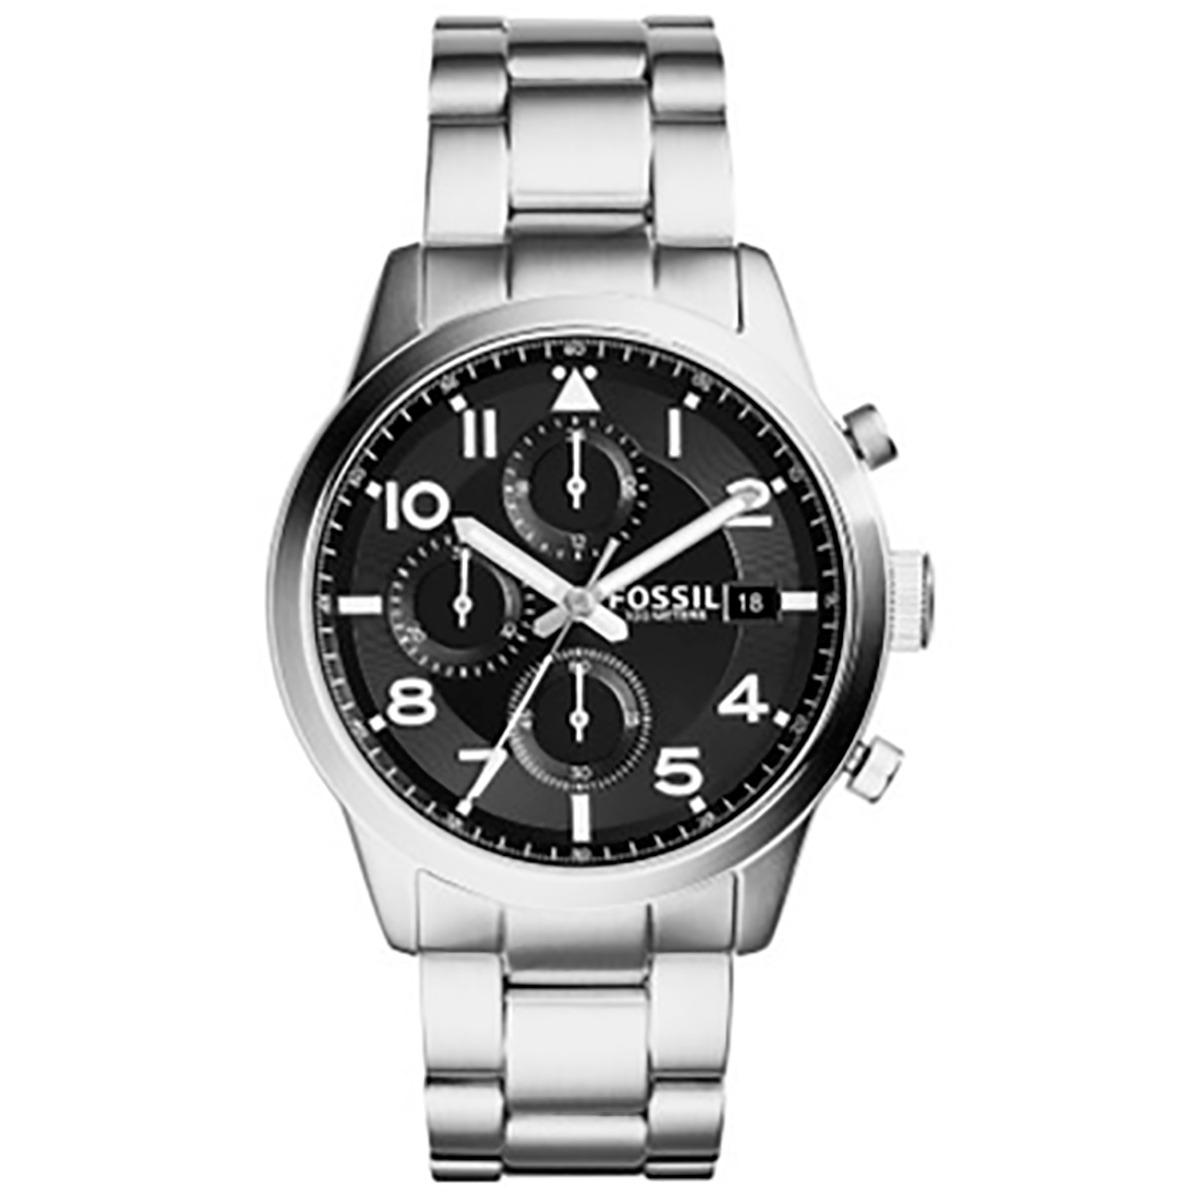 63b87b21ecf06 Relógio Fossil Masculino Fs5137 1pi - R  793,11 em Mercado Livre